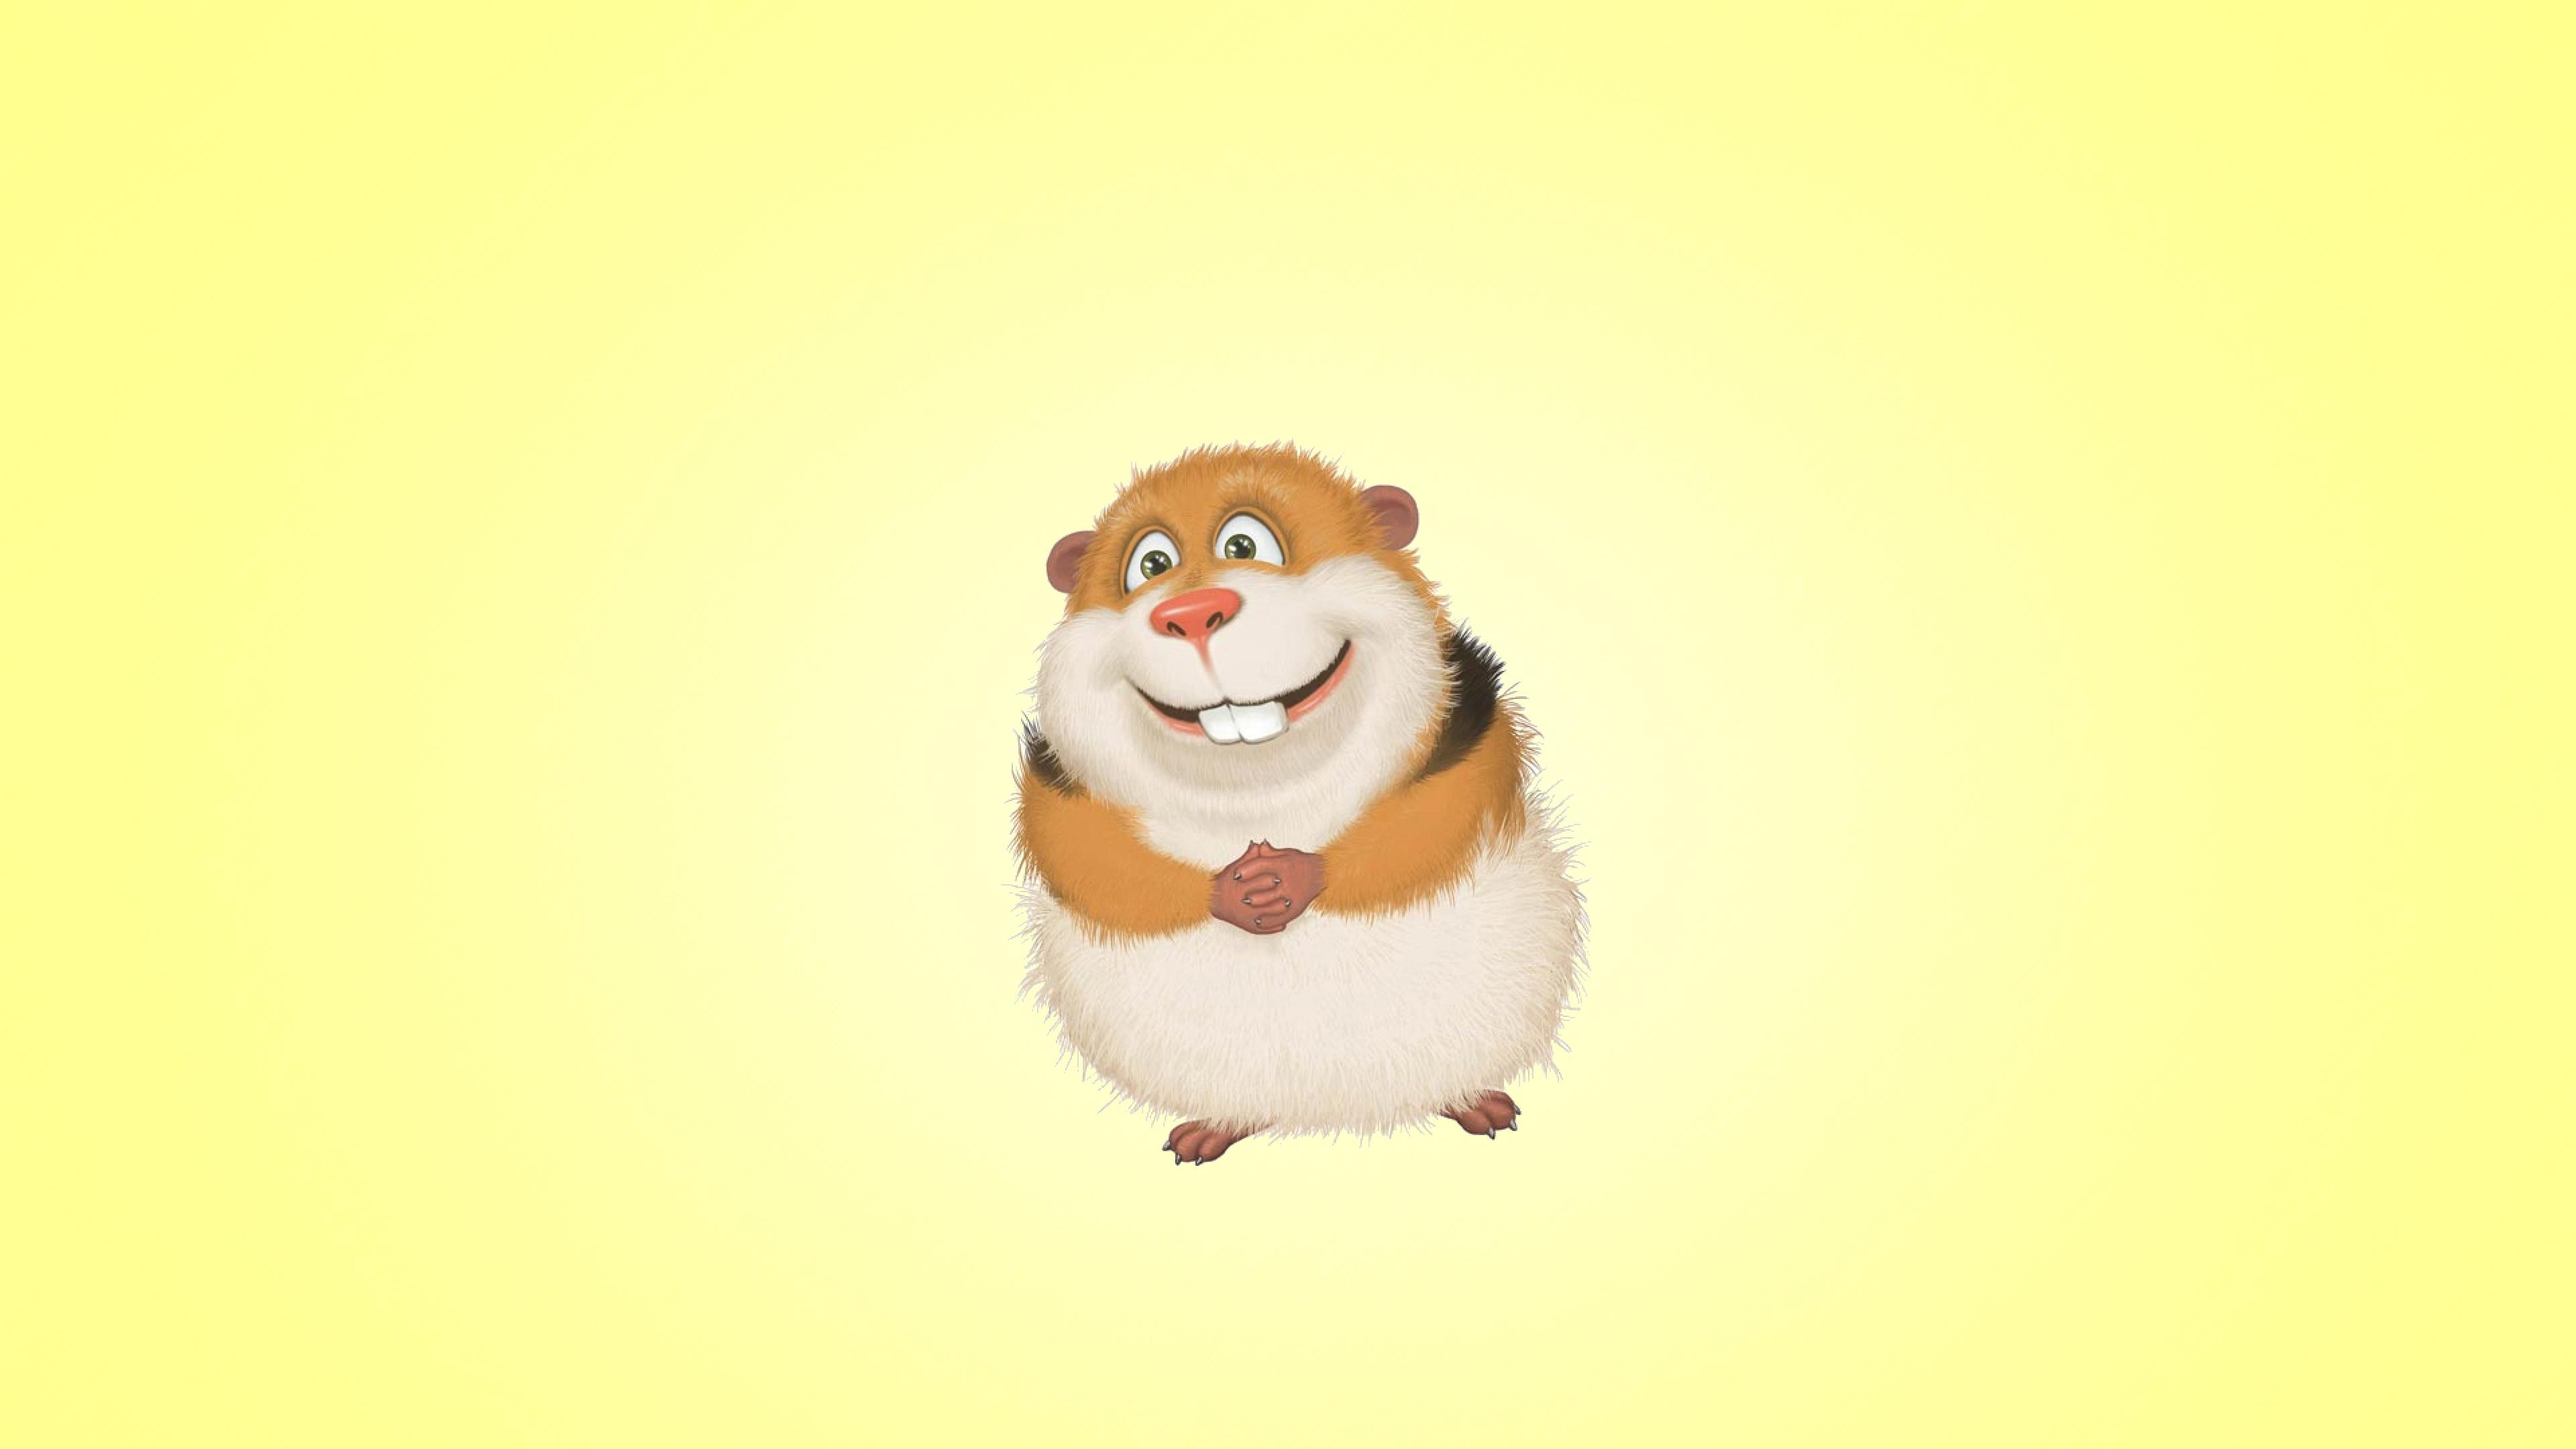 Guinea pig hamster hd cartoons 4k wallpapers images - Pig wallpaper cartoon pig ...